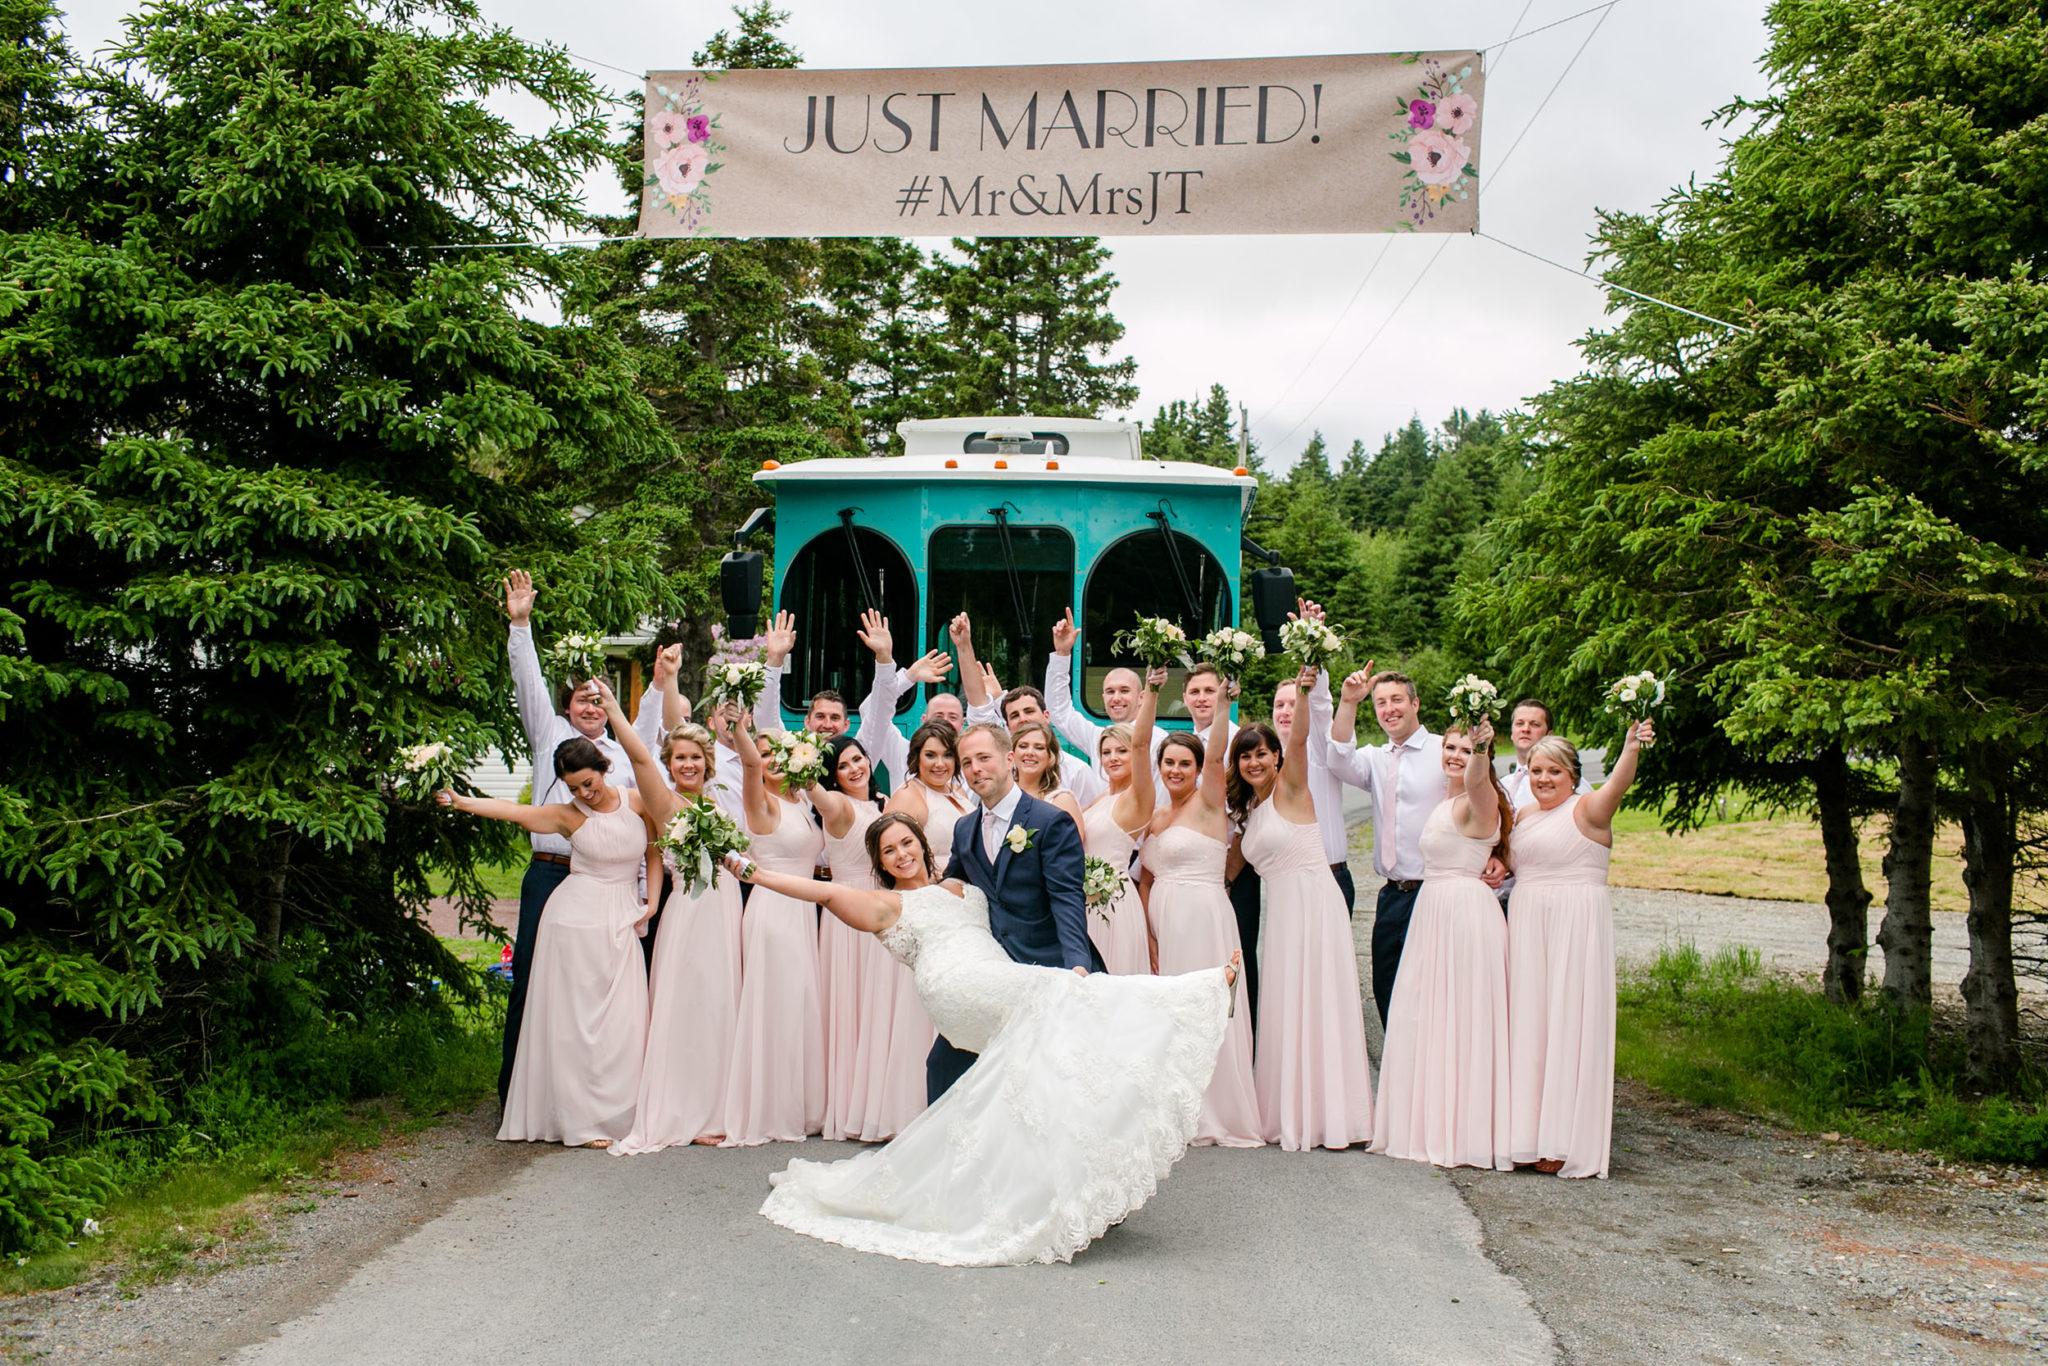 St. John's wedding transportation, Classic Trolley, Green Train, Wedding Transportation NL, Newfoundland weddings, St. John's Wedding Service